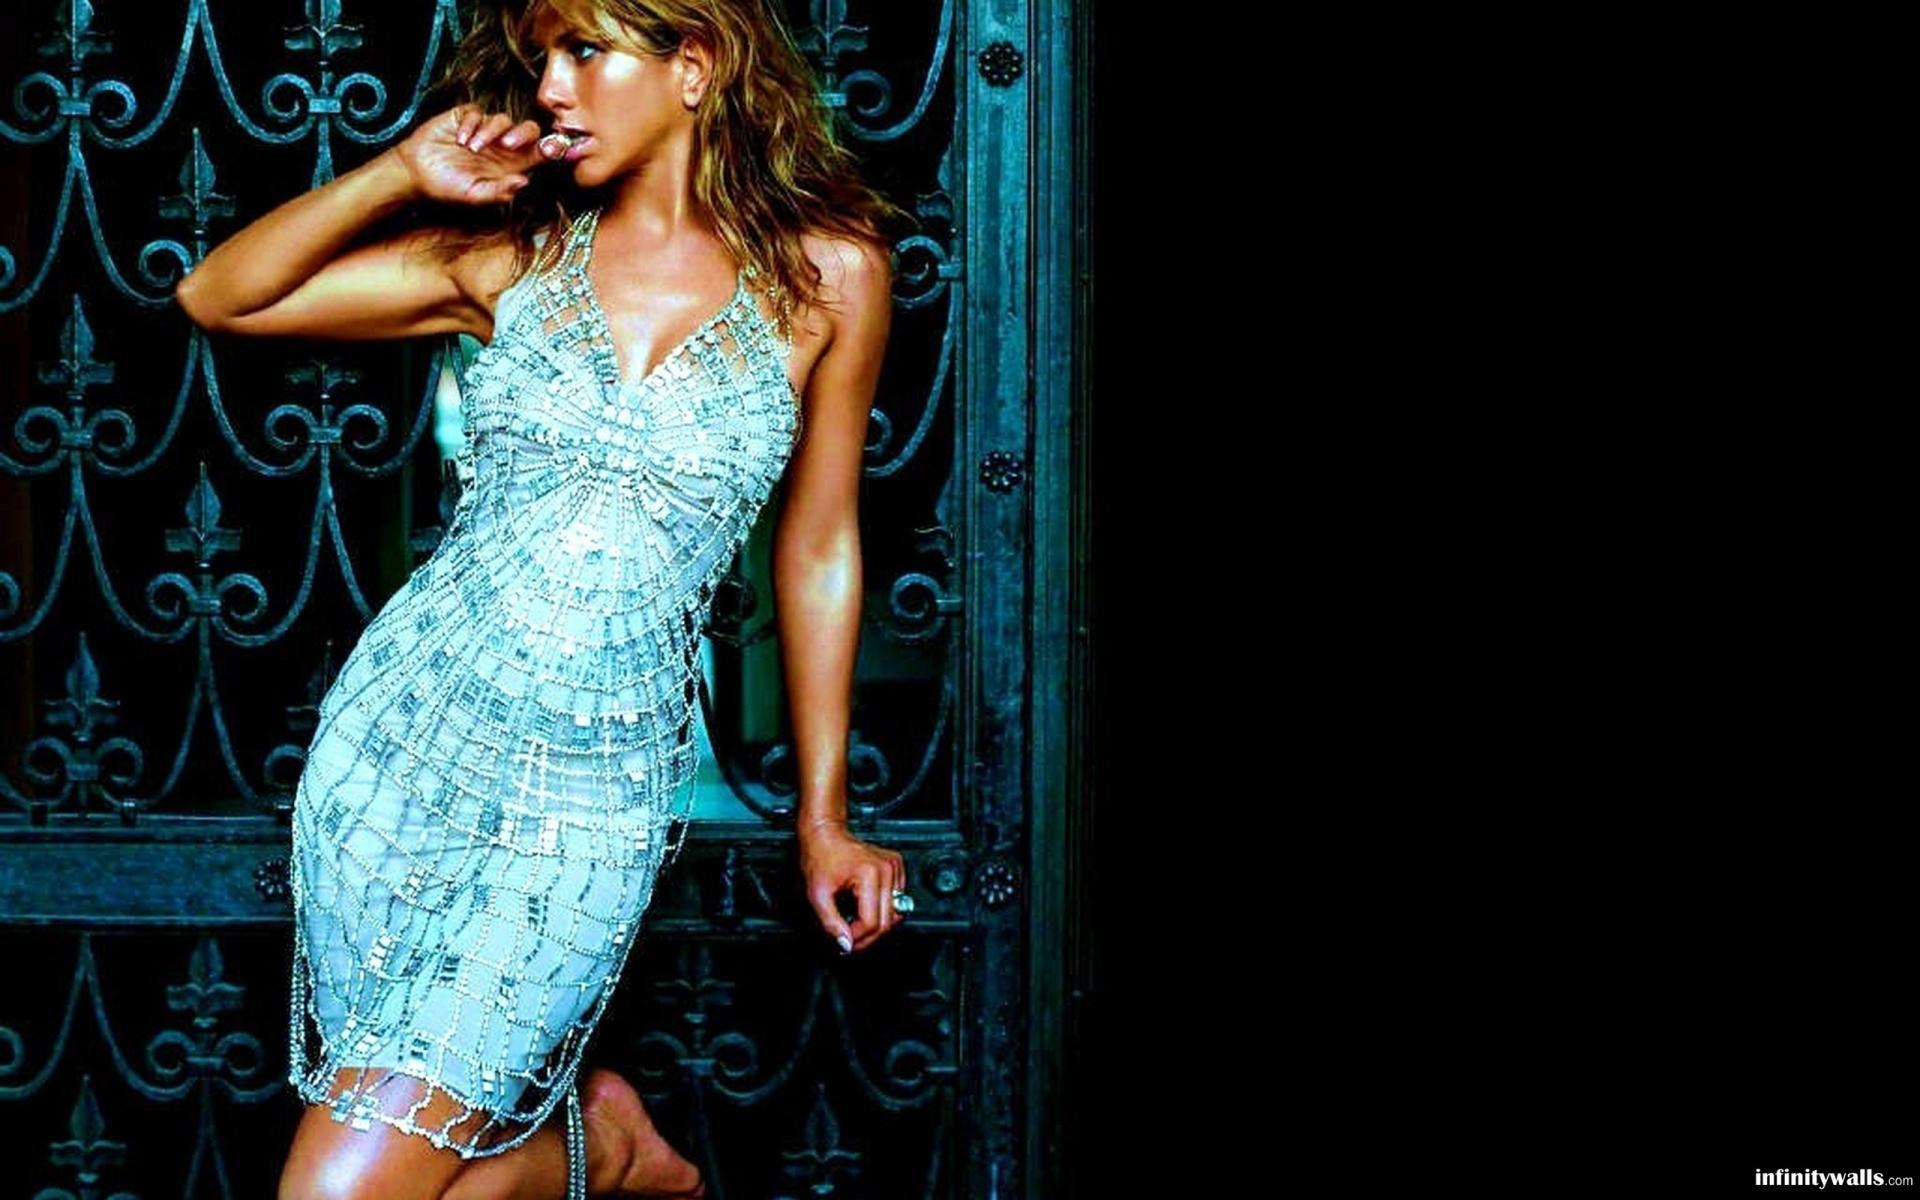 Jennifer Aniston wallpapers HD quality